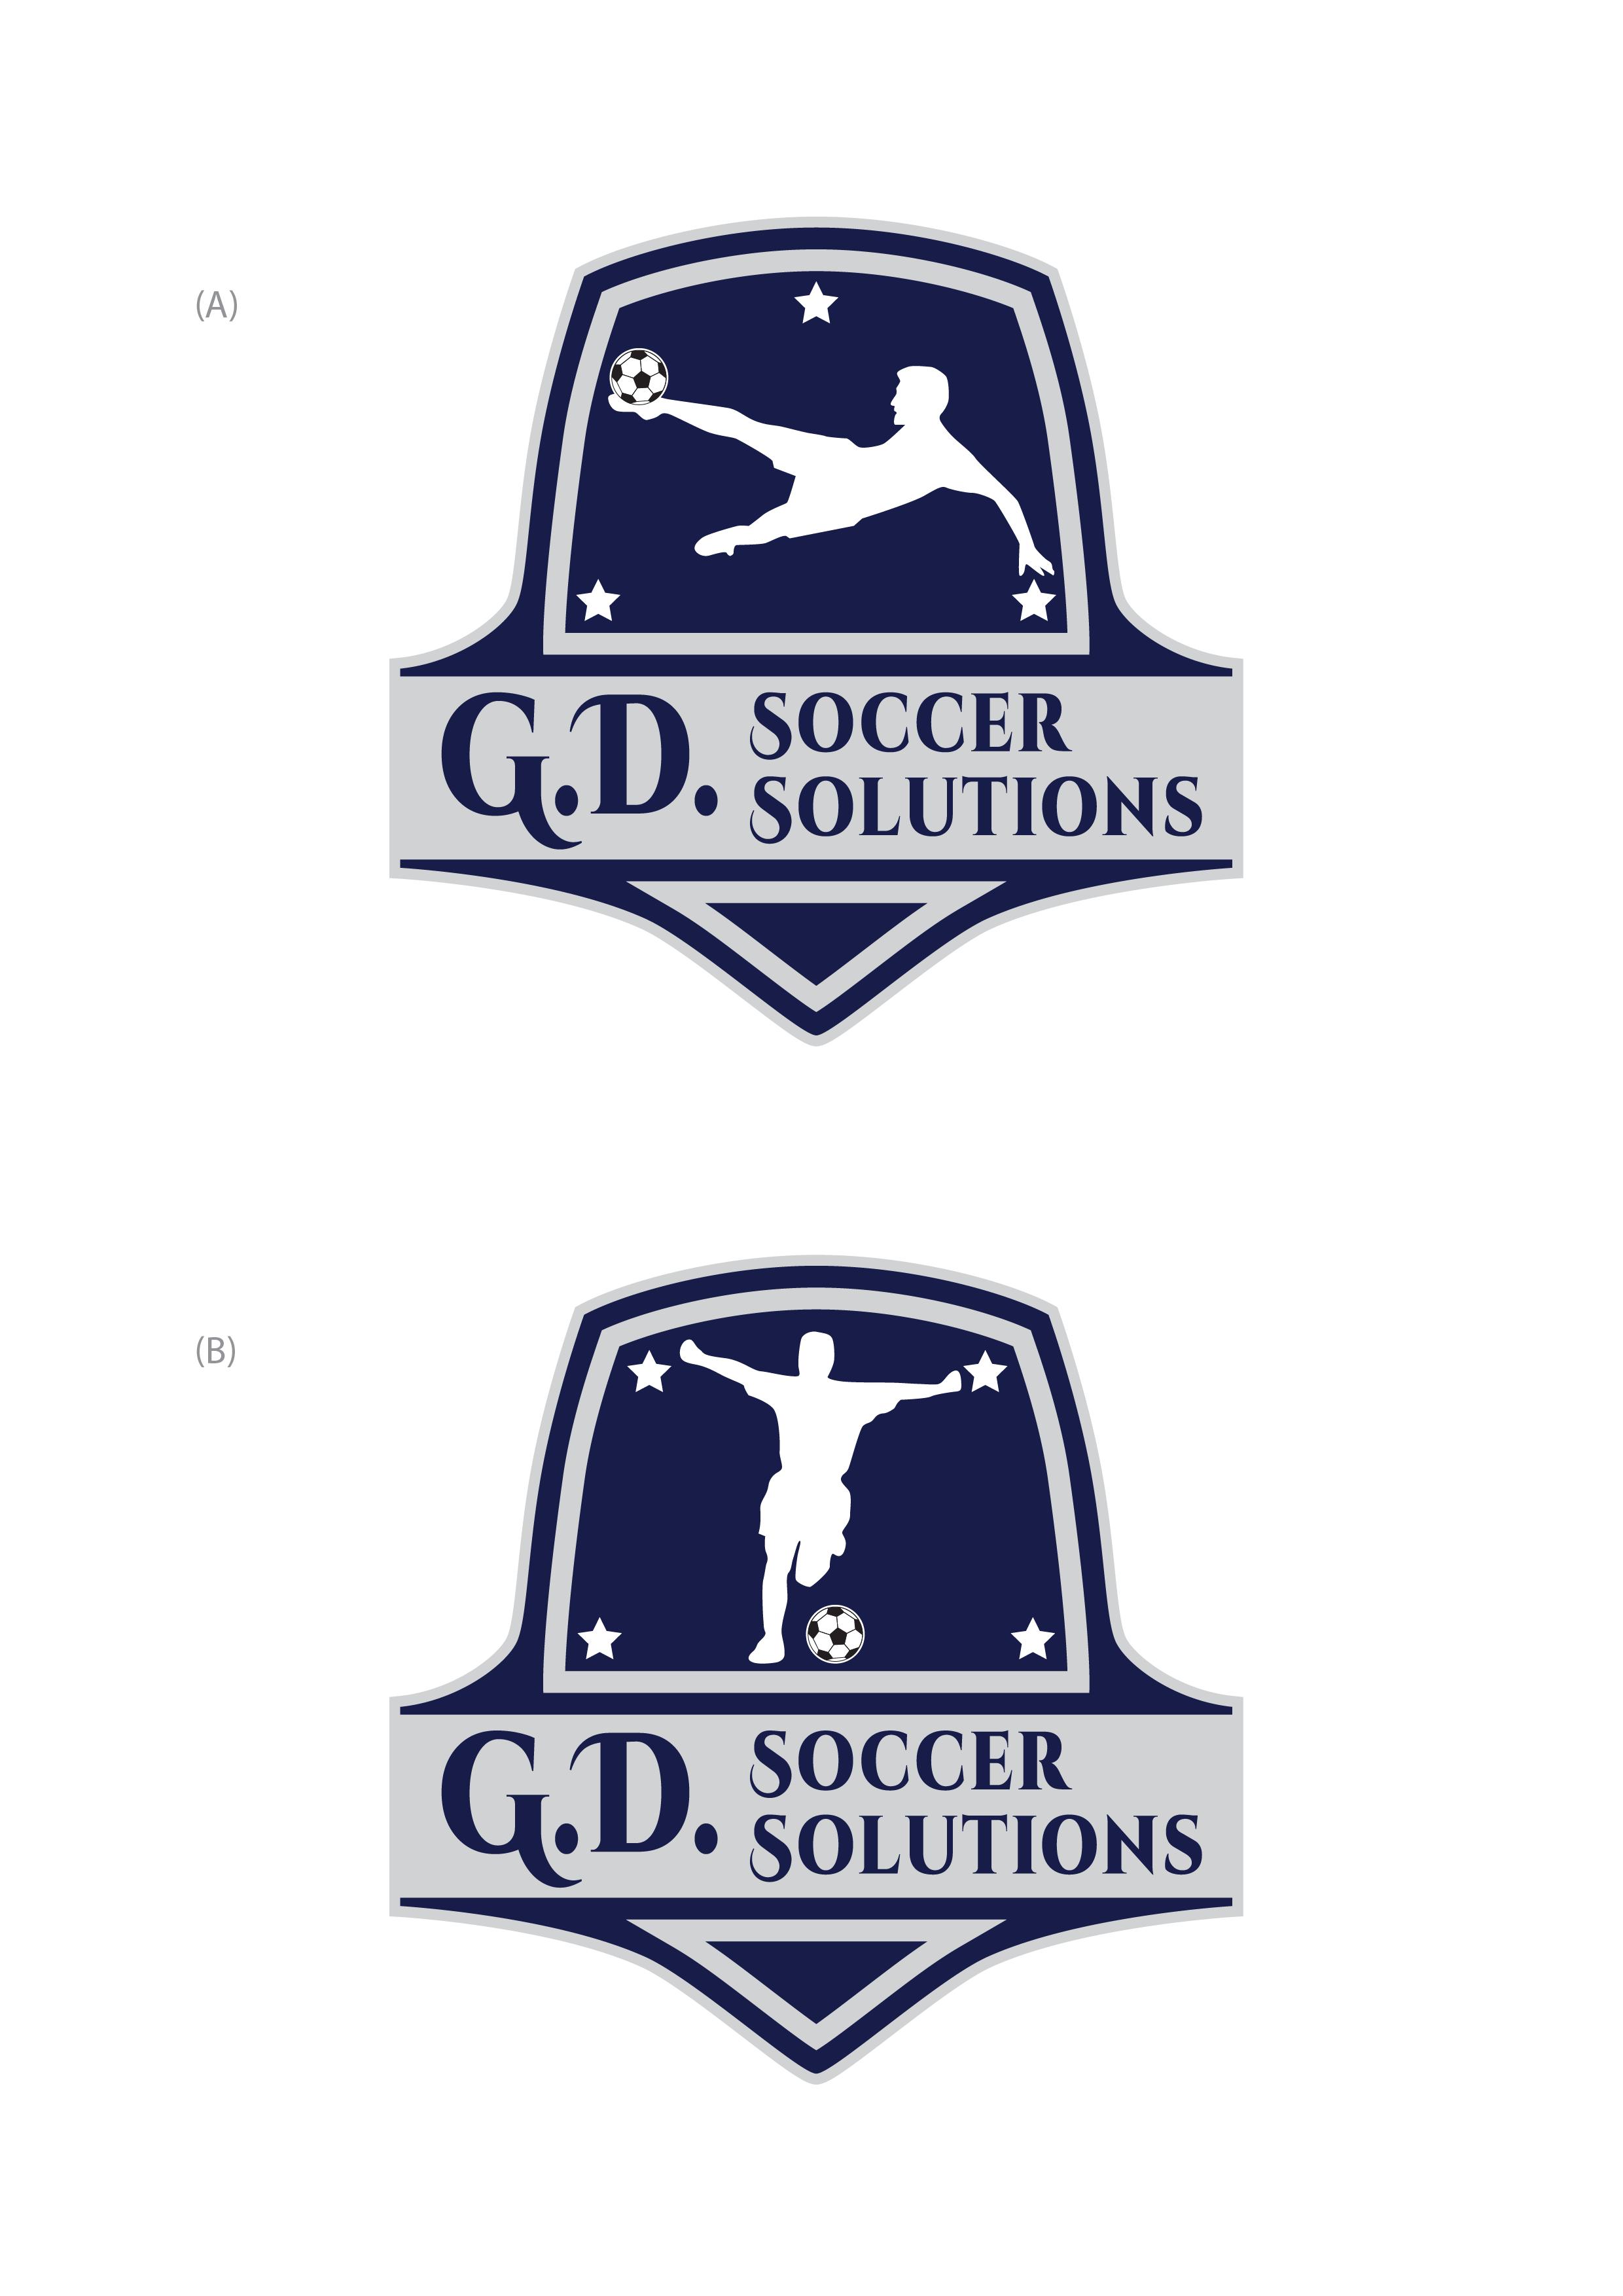 G.D. Soccer Solutions_art2.png